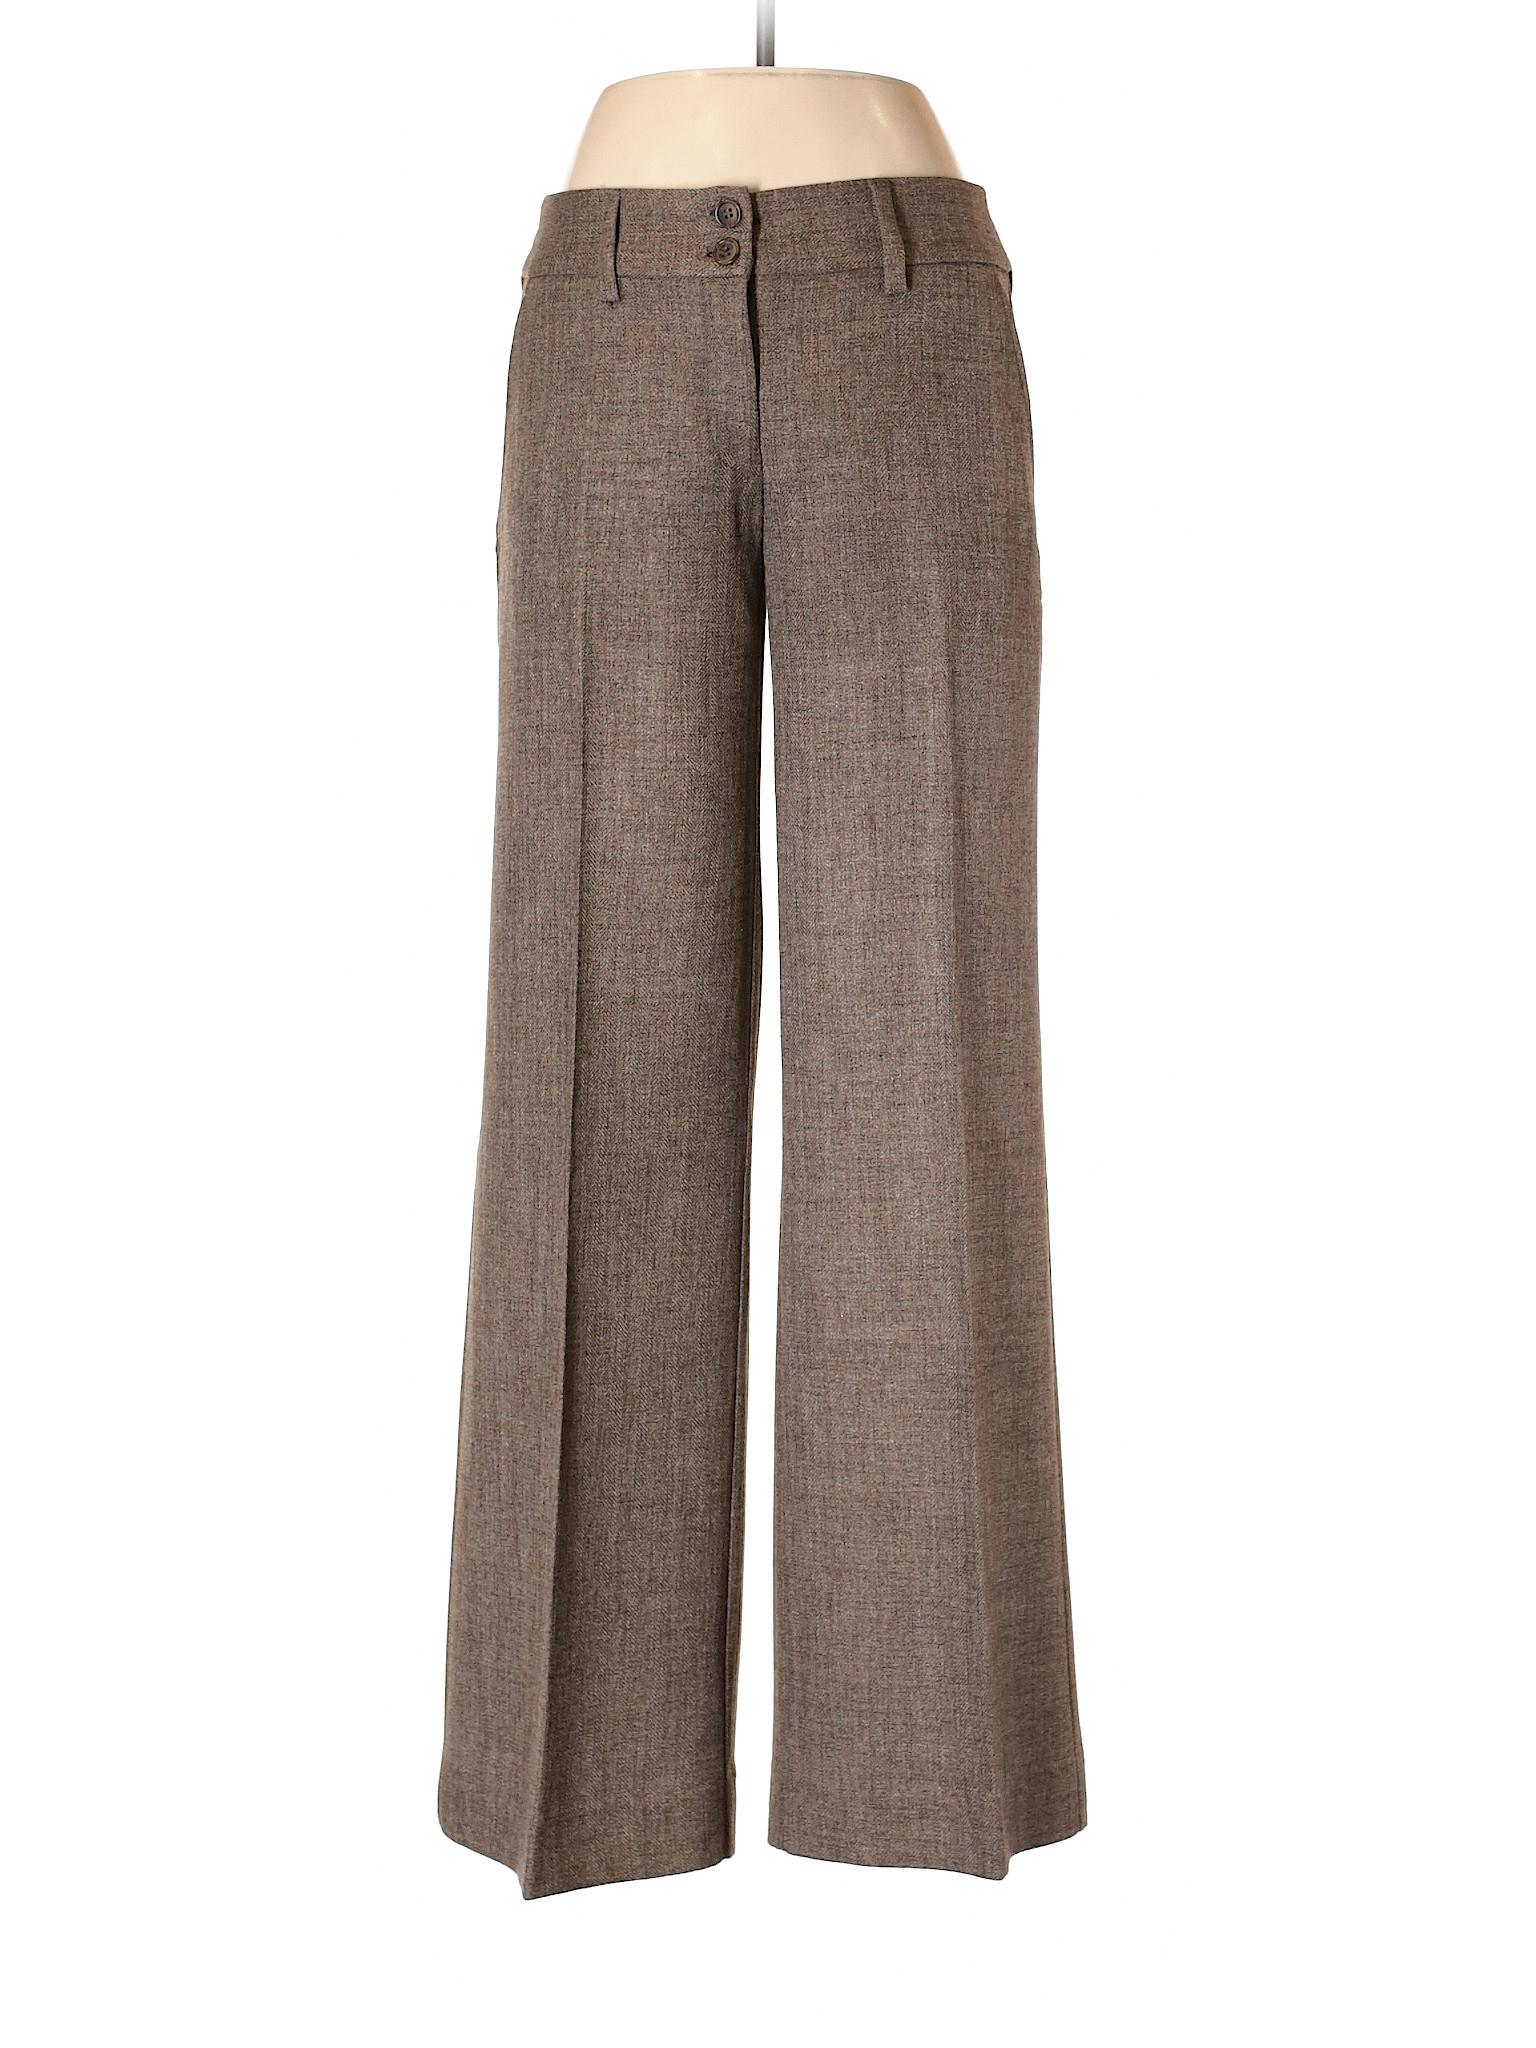 H Boutique Pants amp;M winter Dress 0gZqxSCw